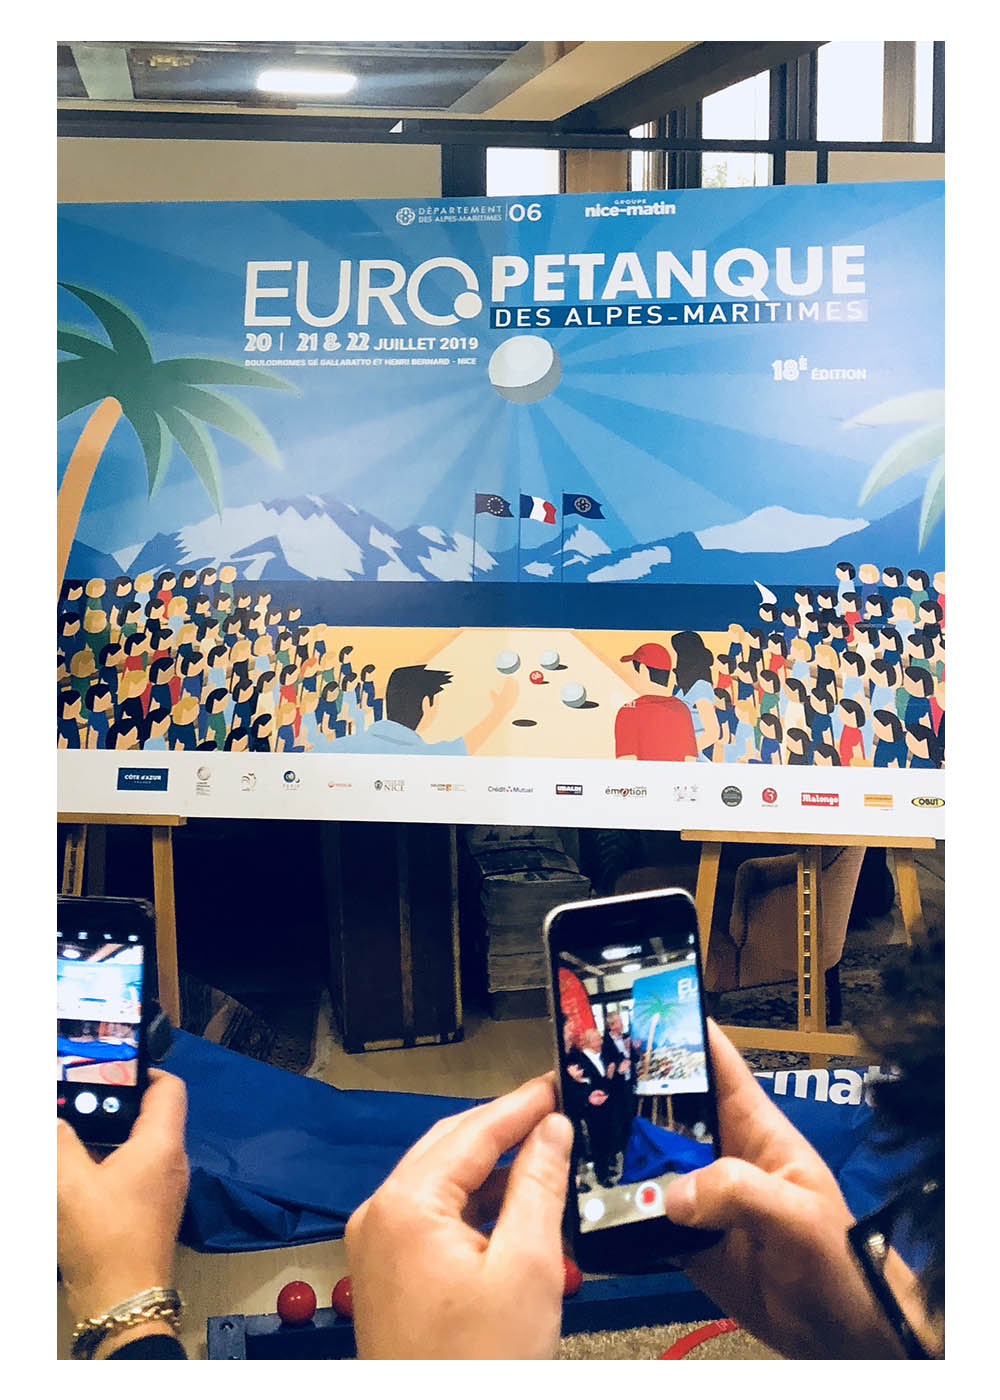 Europétanque, Nice Matin, Affiche Eric Garence 18eme édition Conseil Départemental Alpes Maritimes Pastorino Ciotti Ginesy Nardelli Boulisterie Affiche